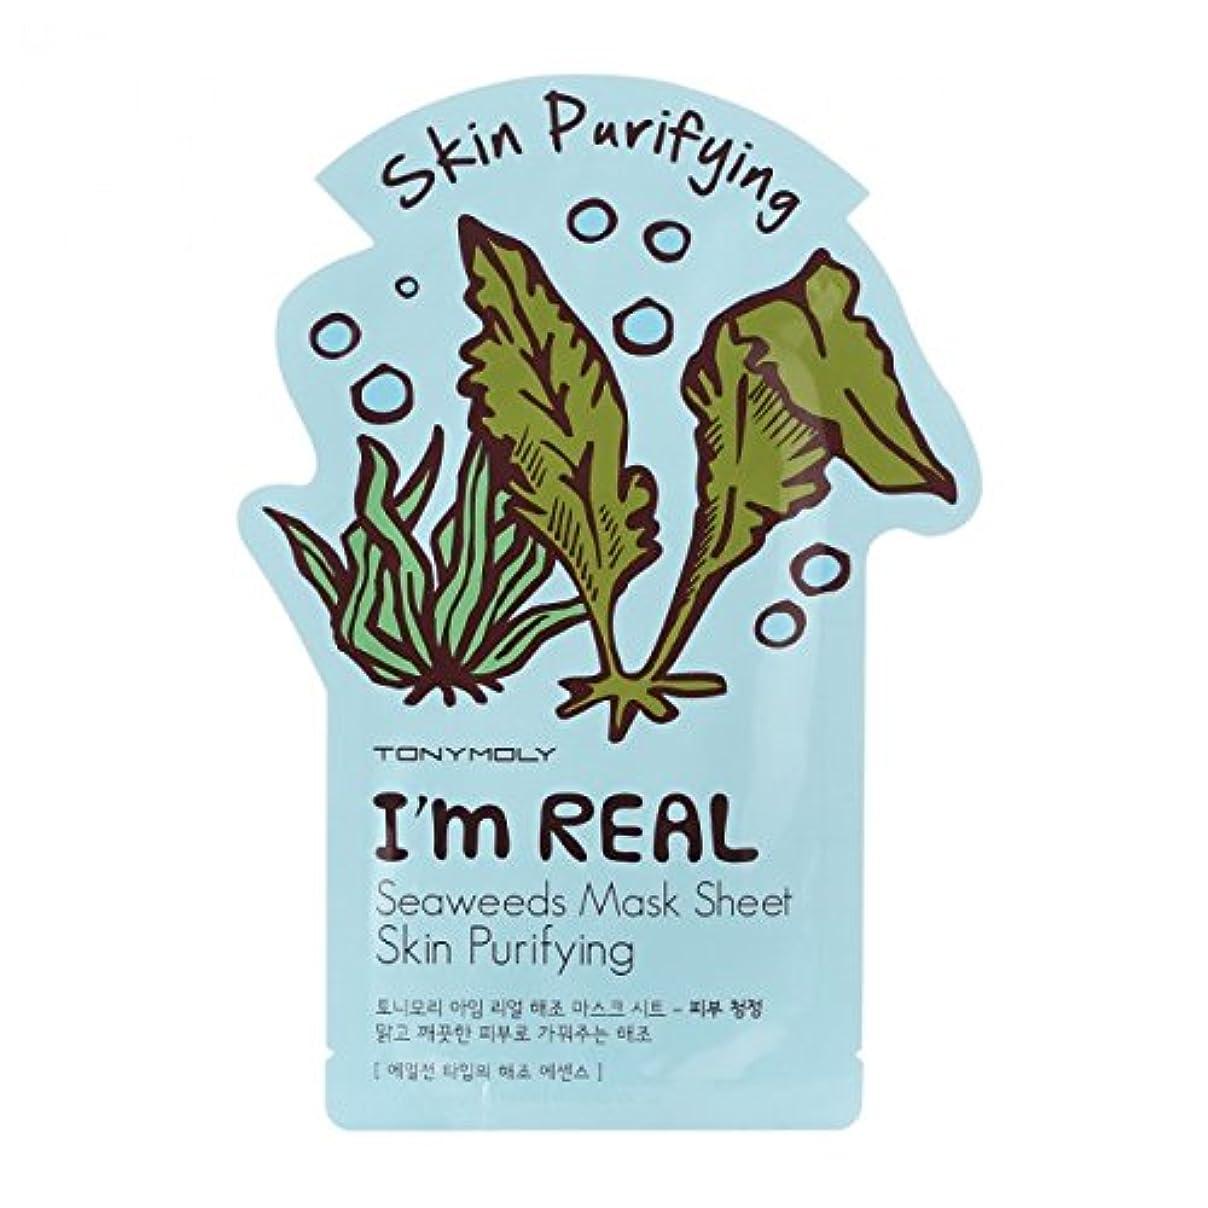 (6 Pack) TONYMOLY I'm Real Seaweeds Mask Sheet Skin Purifying (並行輸入品)